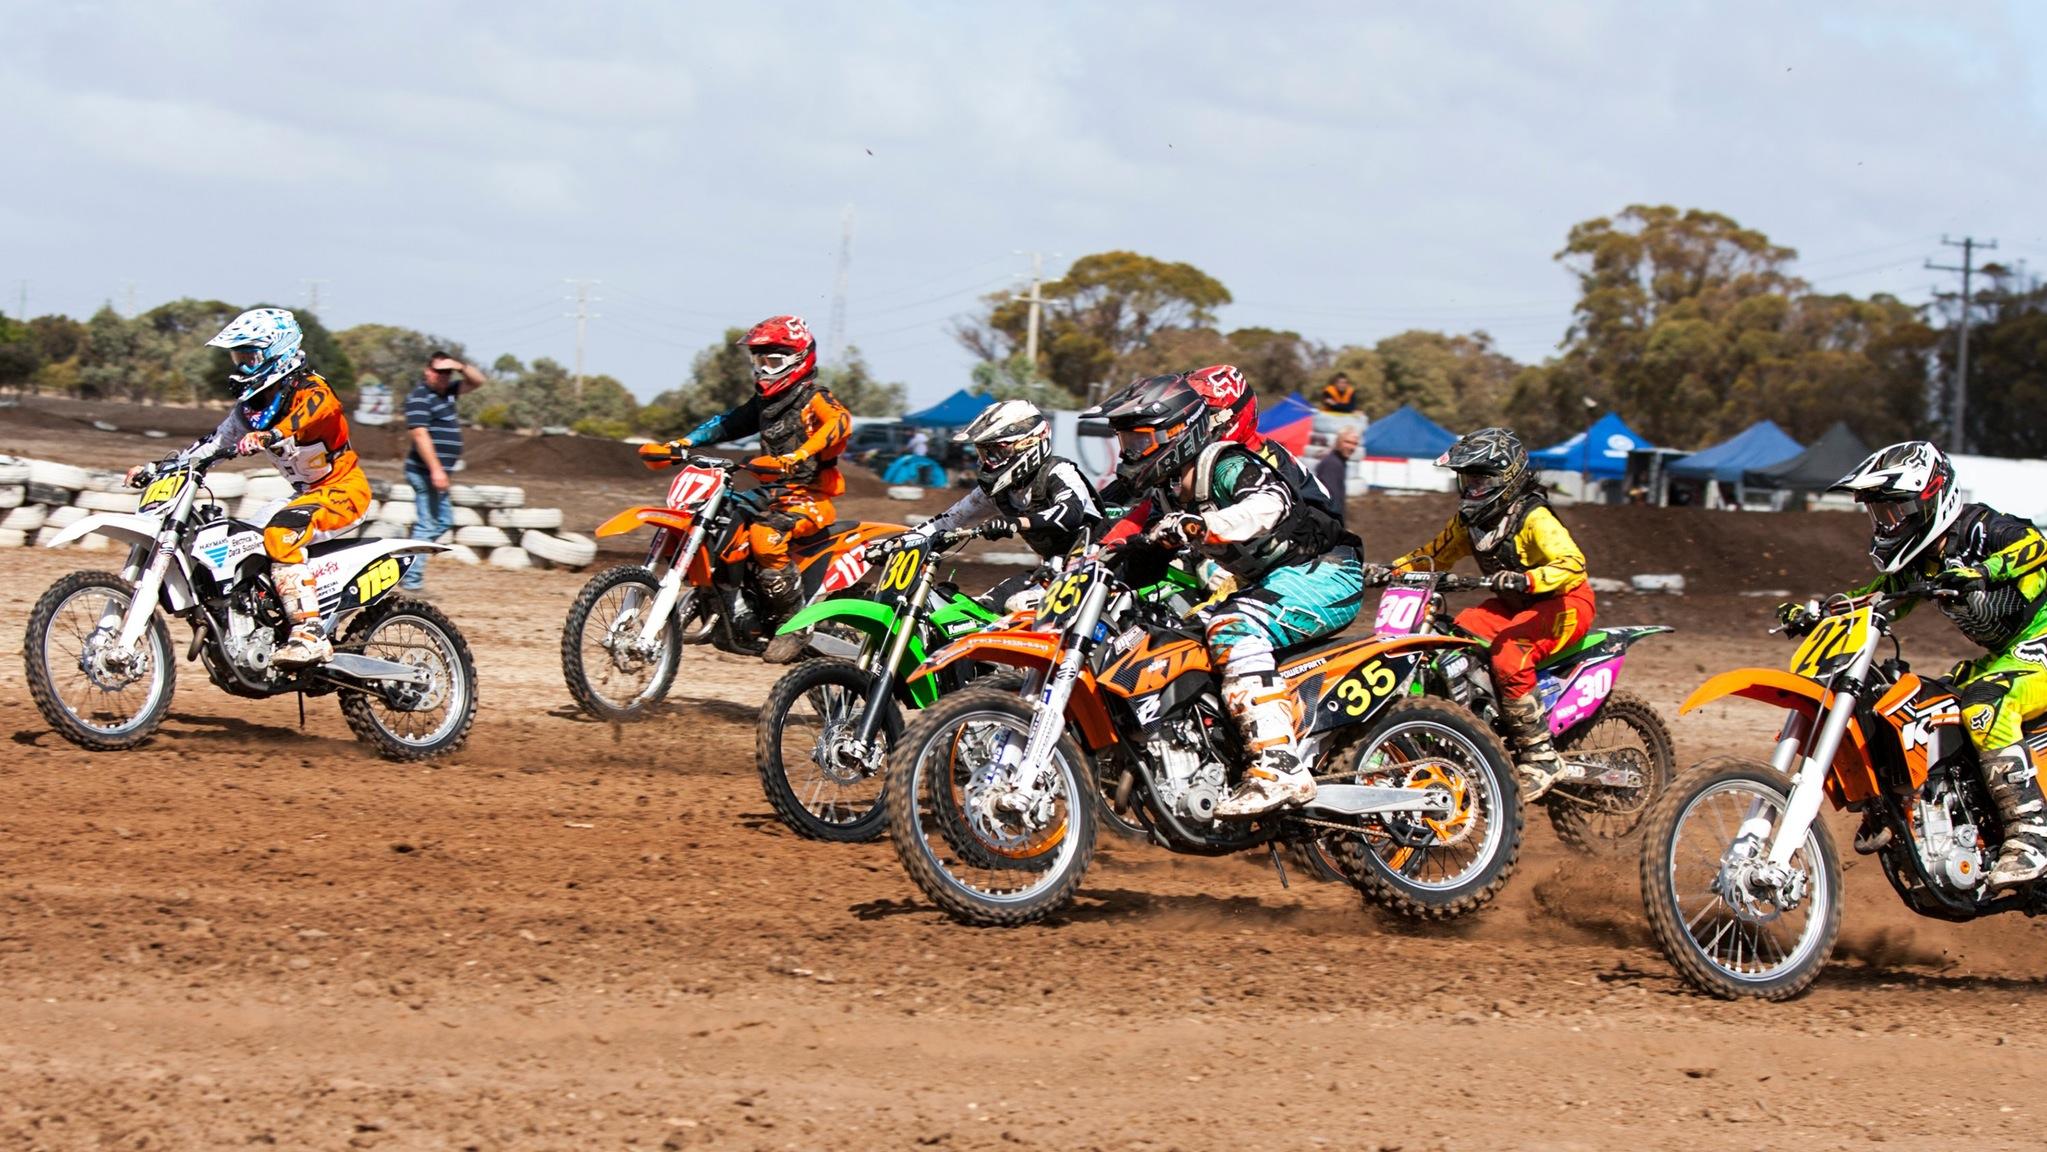 Kids on motor bikes on dirt track